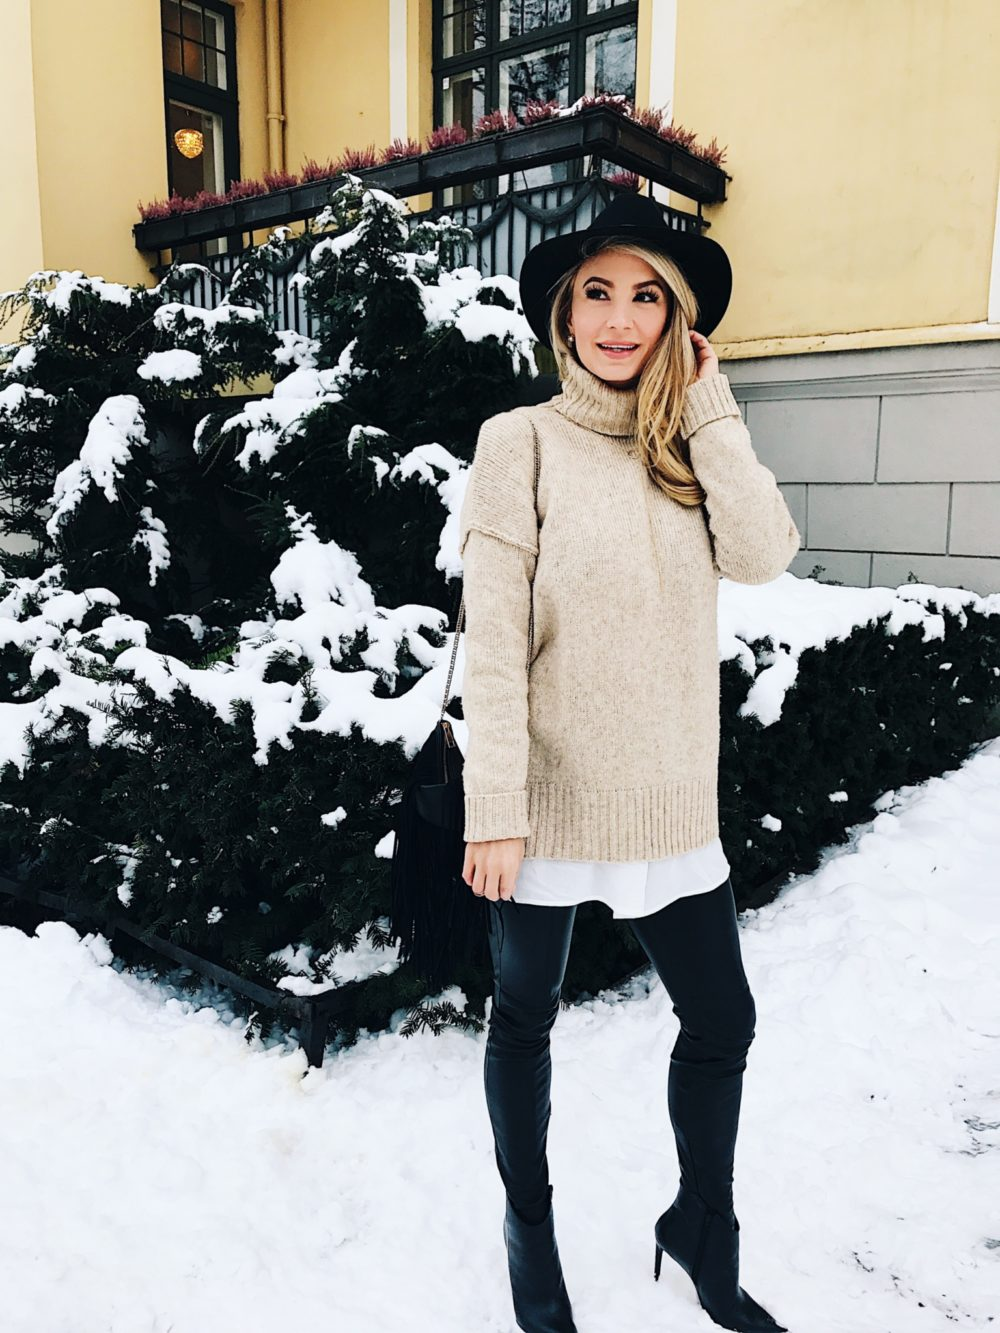 Sweater-Weather-10.jpg